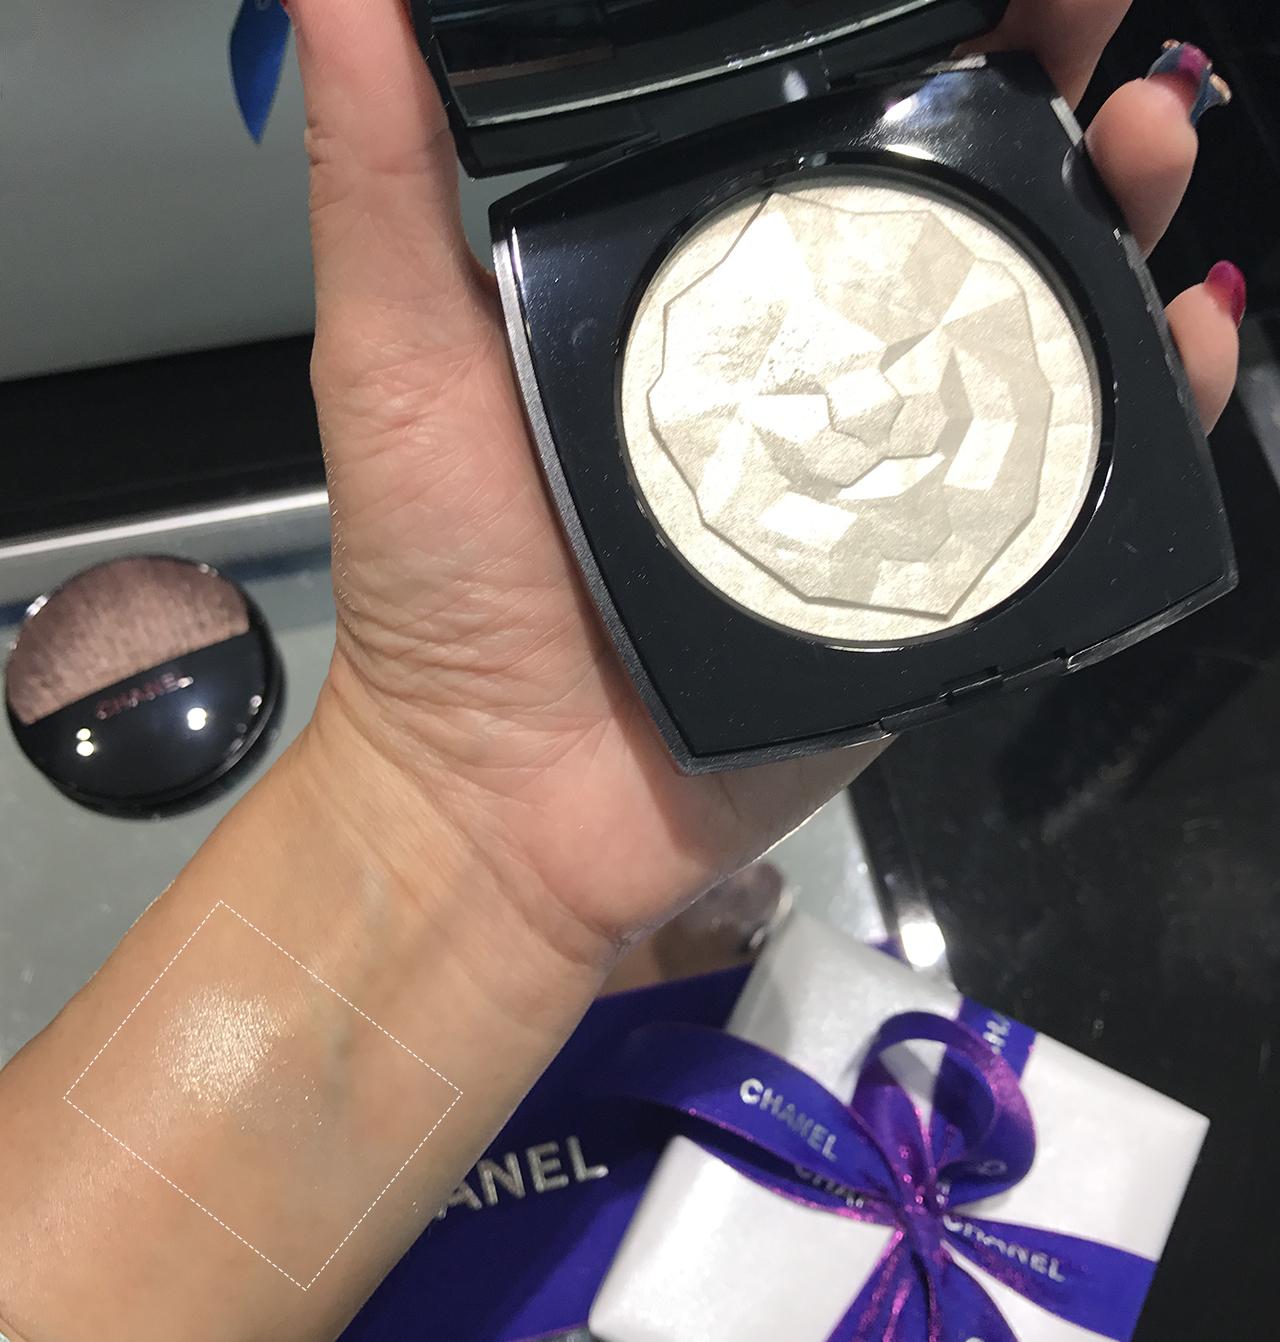 Chanel Le Signe du Lion Or Blanc Illuminating Powder